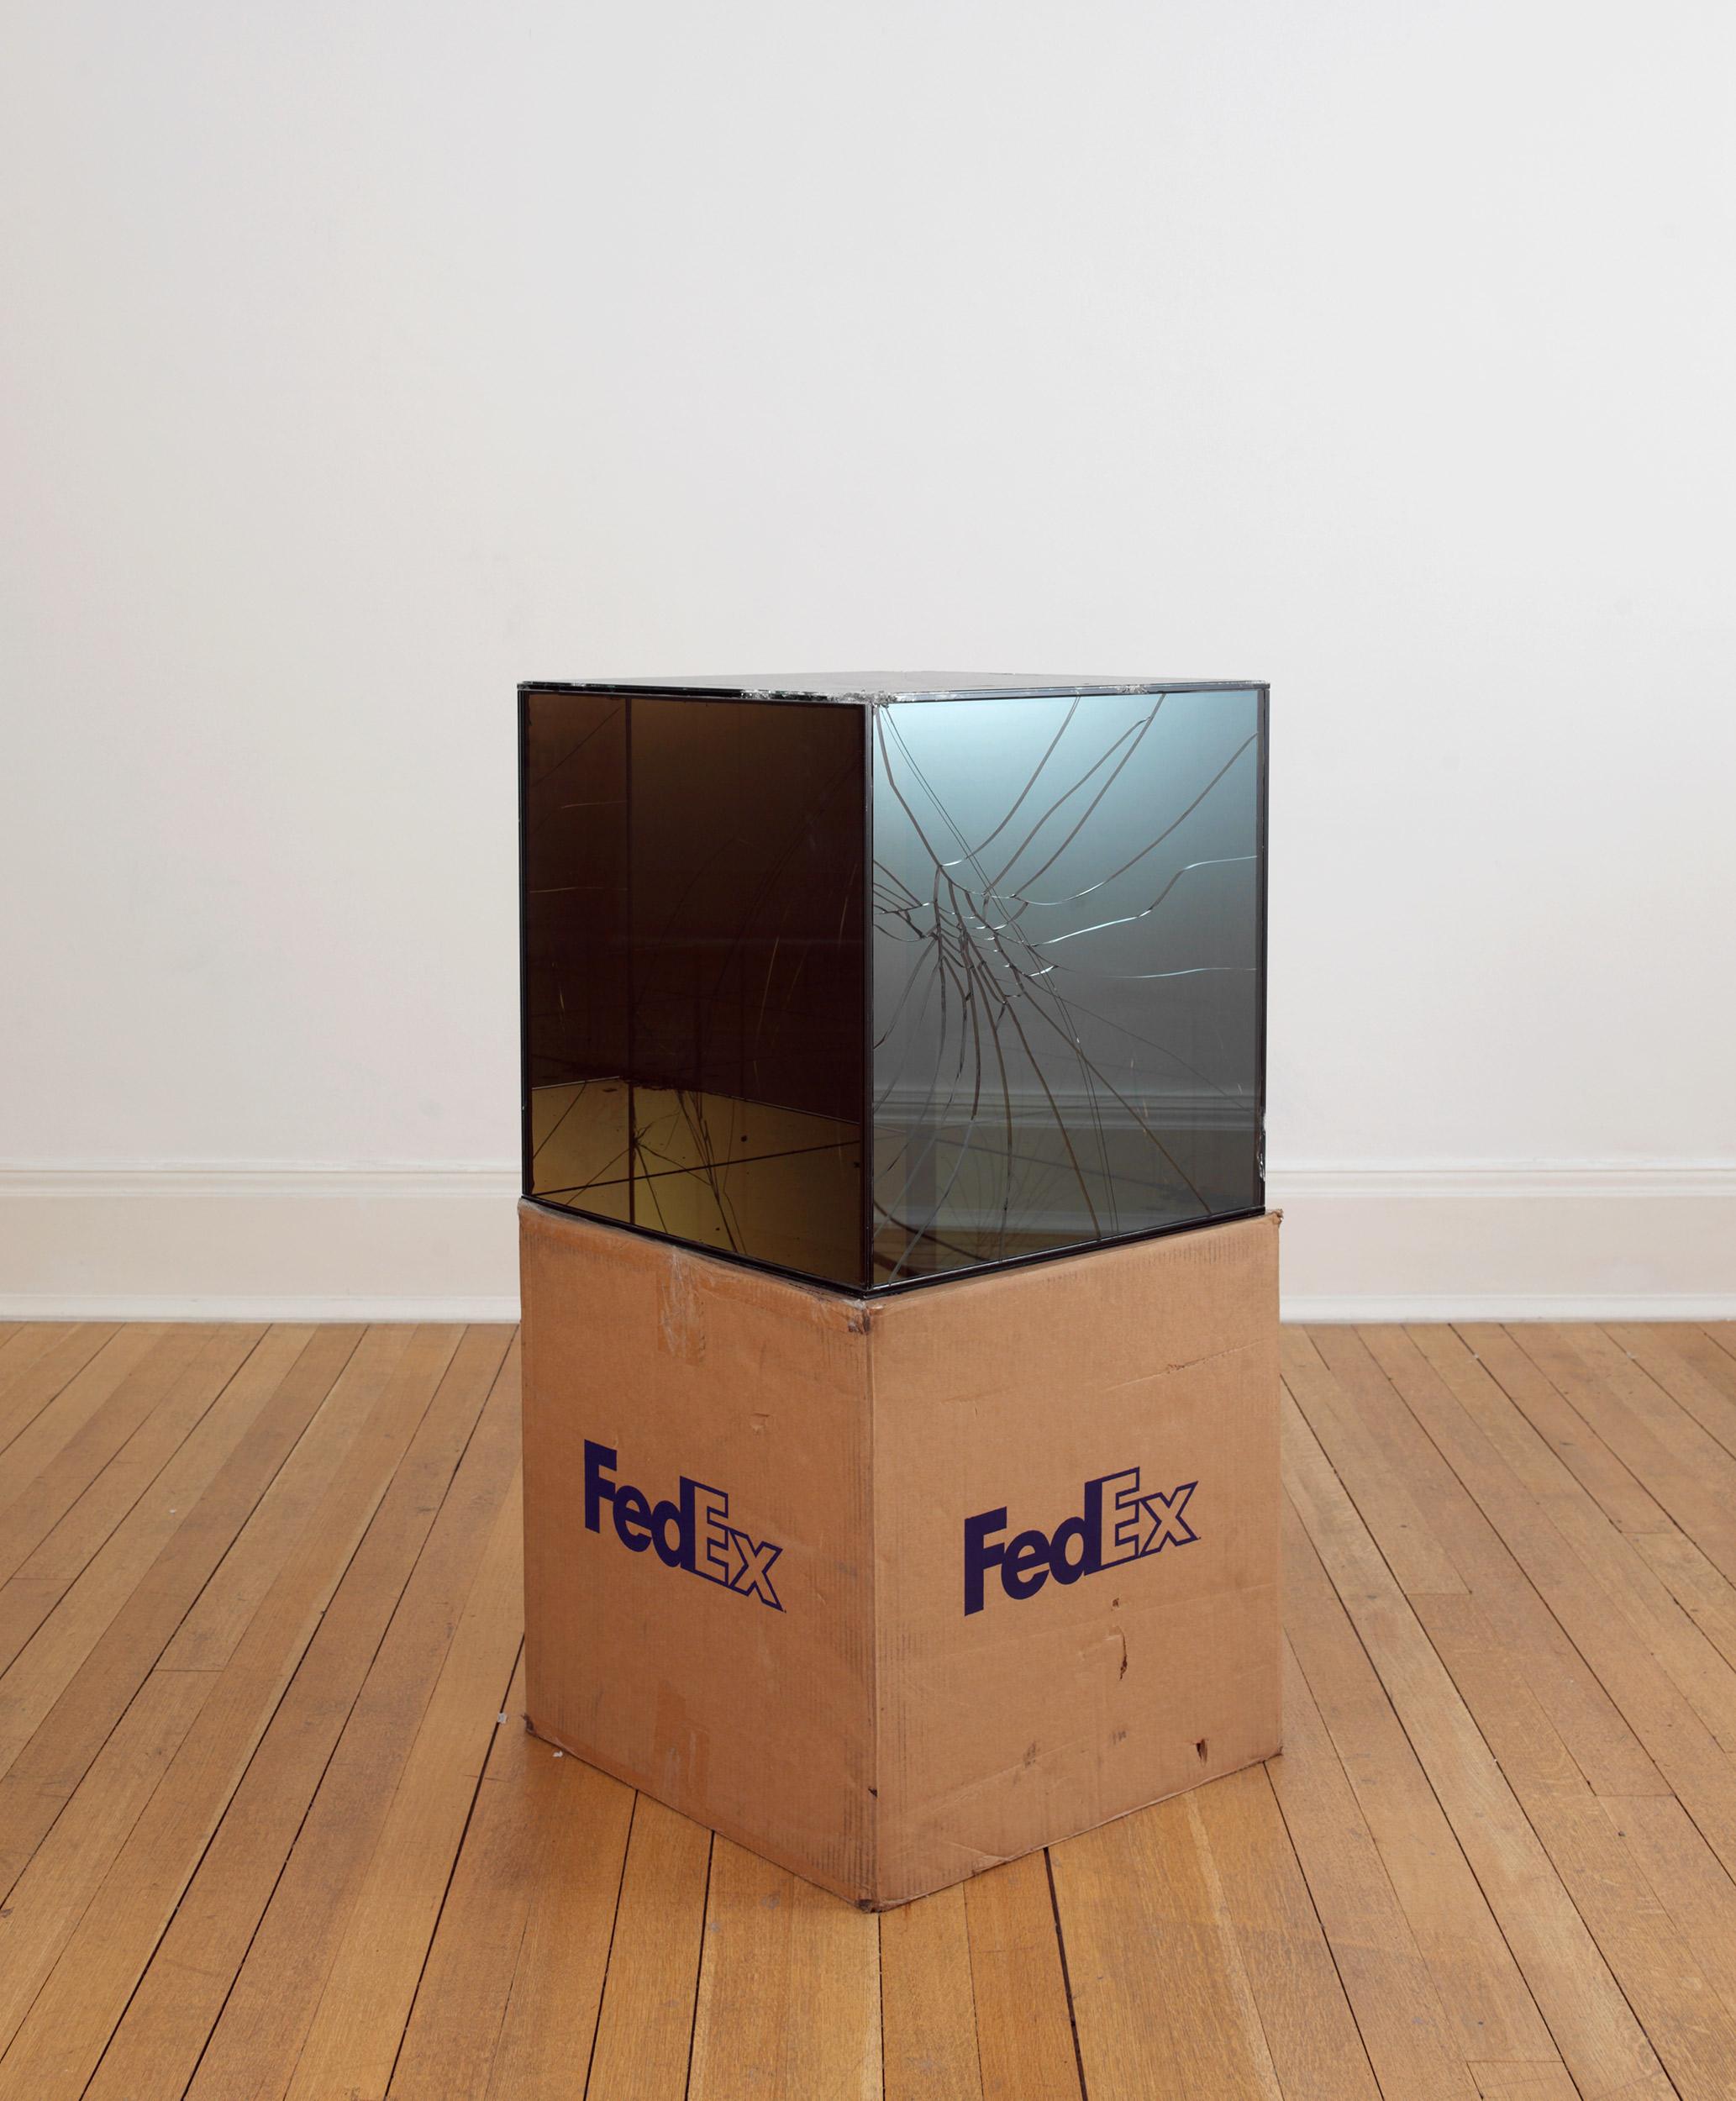 FedEx® Large Kraft Box  © 2008 FEDEX 330510 REV 6/08 GP, International Priority, Los Angeles–London trk#868587728072, October 02–05, 2009   2009–  Laminated Mirropane, FedEx shipping box, accrued FedEx shipping and tracking labels, silicone, metal, tape  20 x 20 x 20 inches   FedEx Glass Works, 2007–    Production Stills, 2009